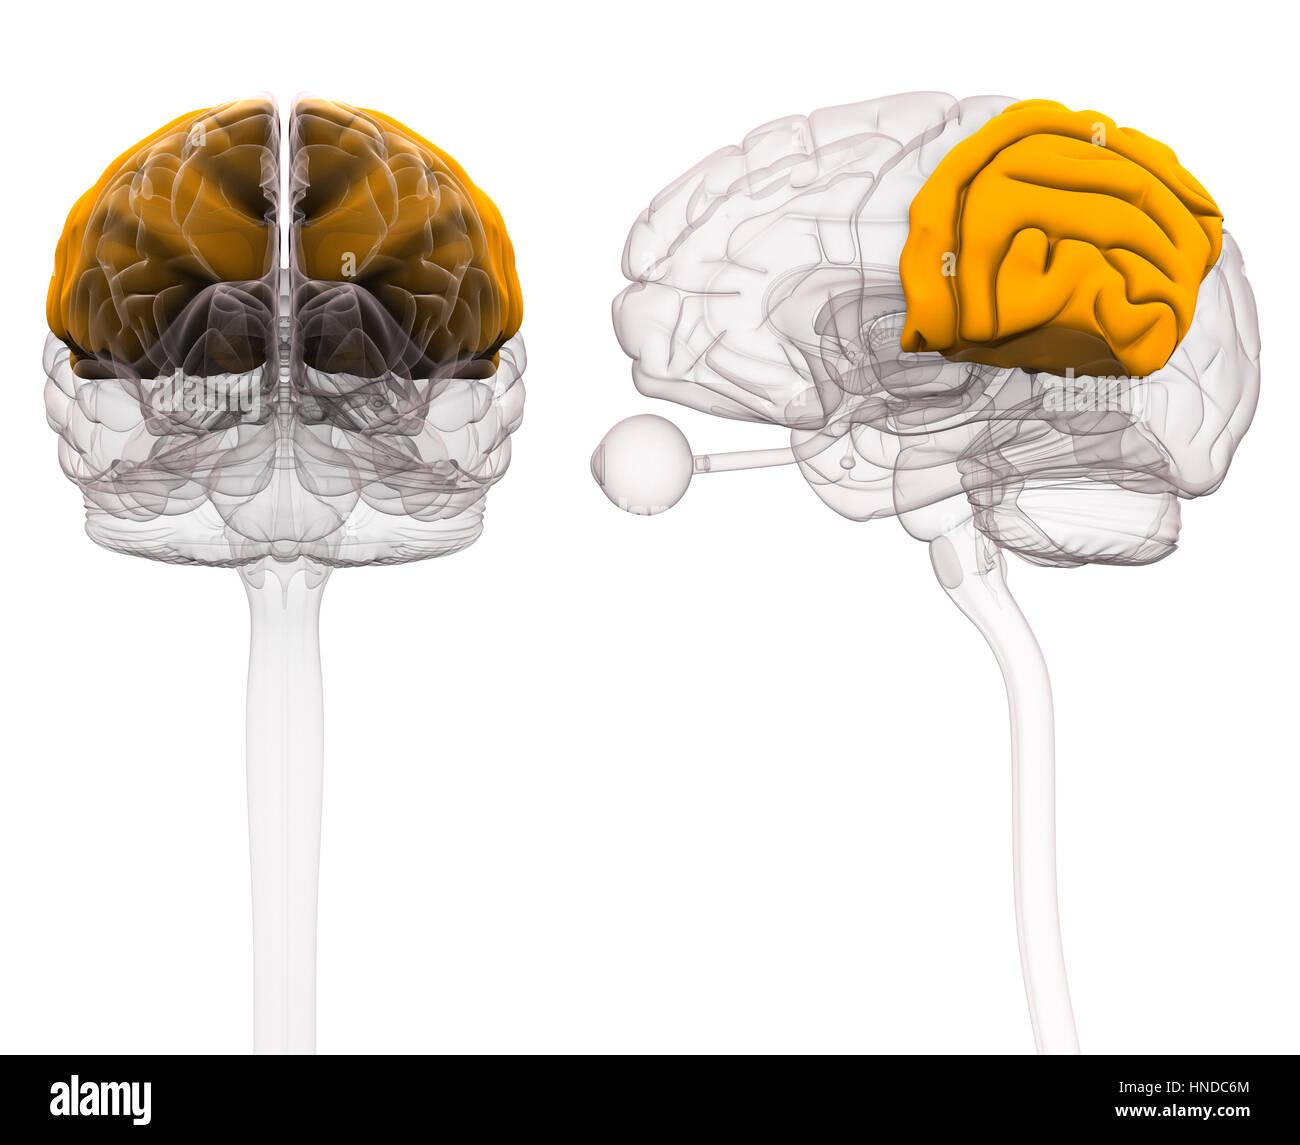 Parietal Brain Anatomy - 3d illustration Stock Photo: 133675324 - Alamy